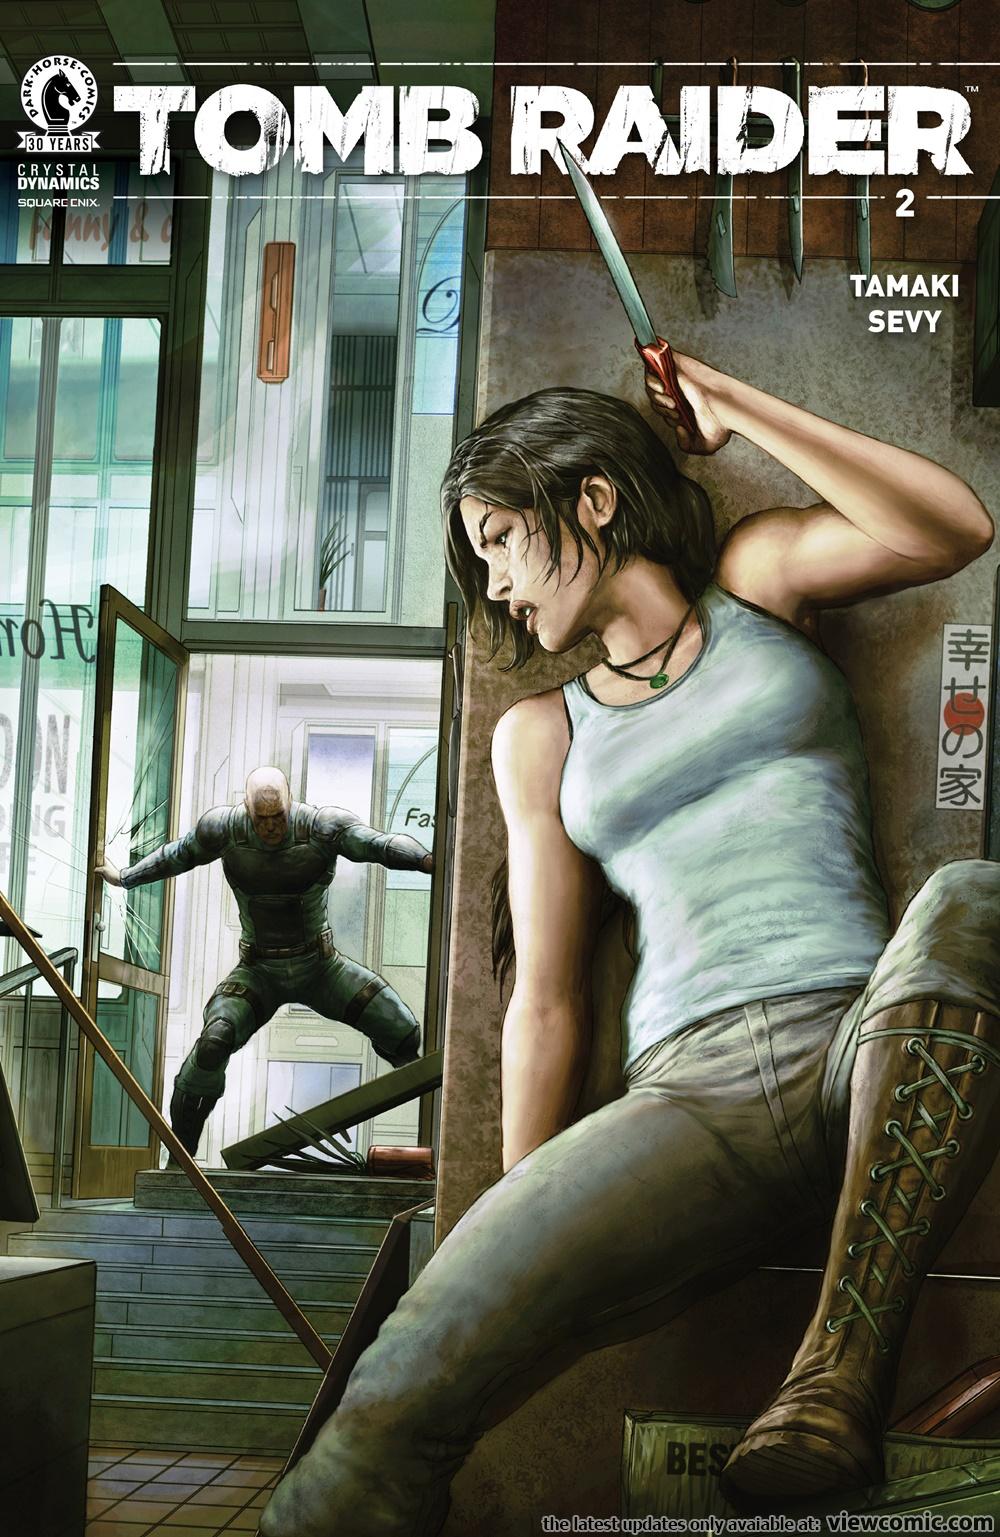 Tomb Raider | Viewcomic reading comics online for free 2019